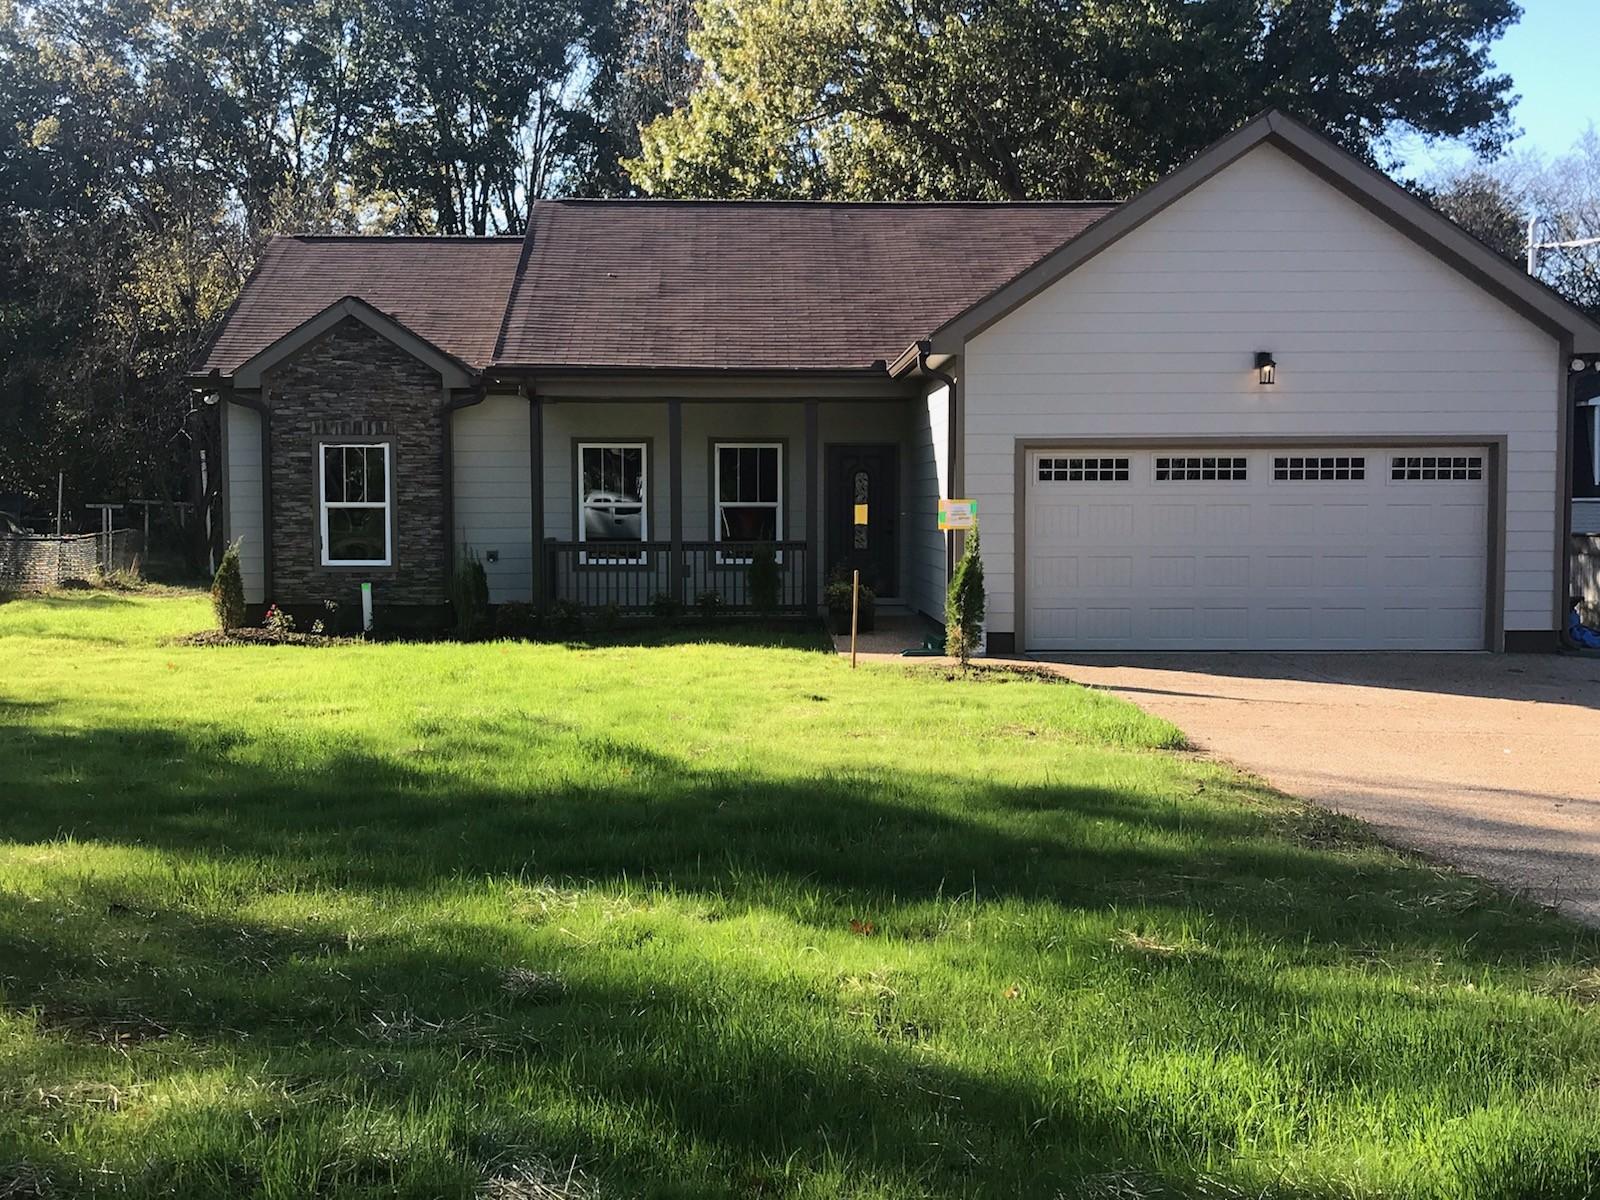 116 John D St, LA VERGNE, TN 37086 - LA VERGNE, TN real estate listing